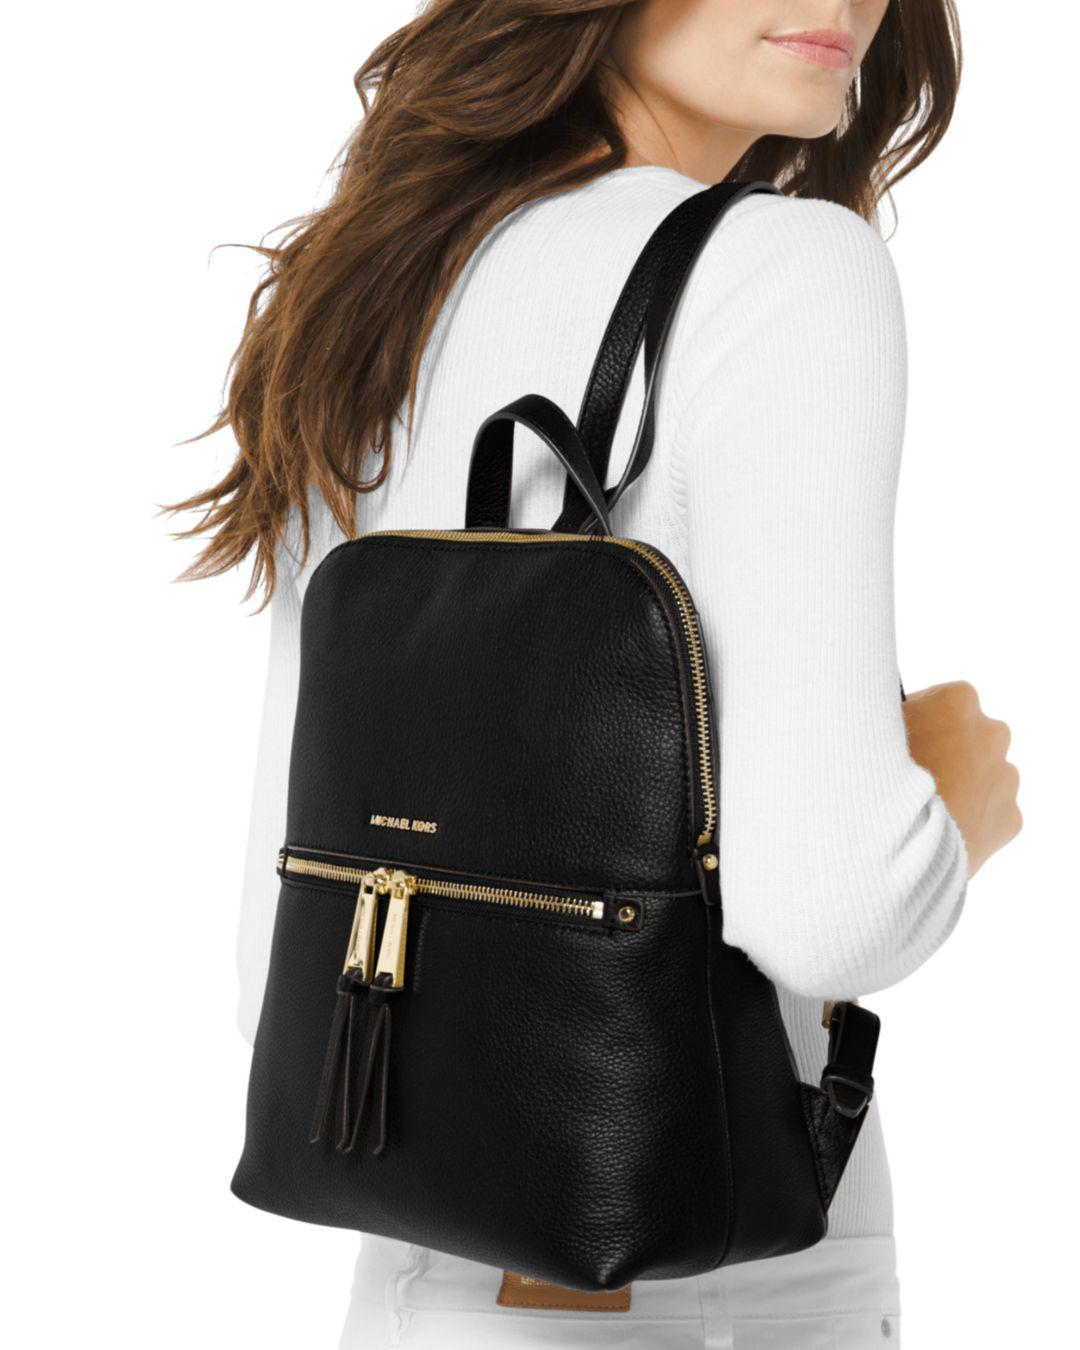 fae677ca837f6 Lyst - MICHAEL Michael Kors Rhea Medium Slim Backpack in Black